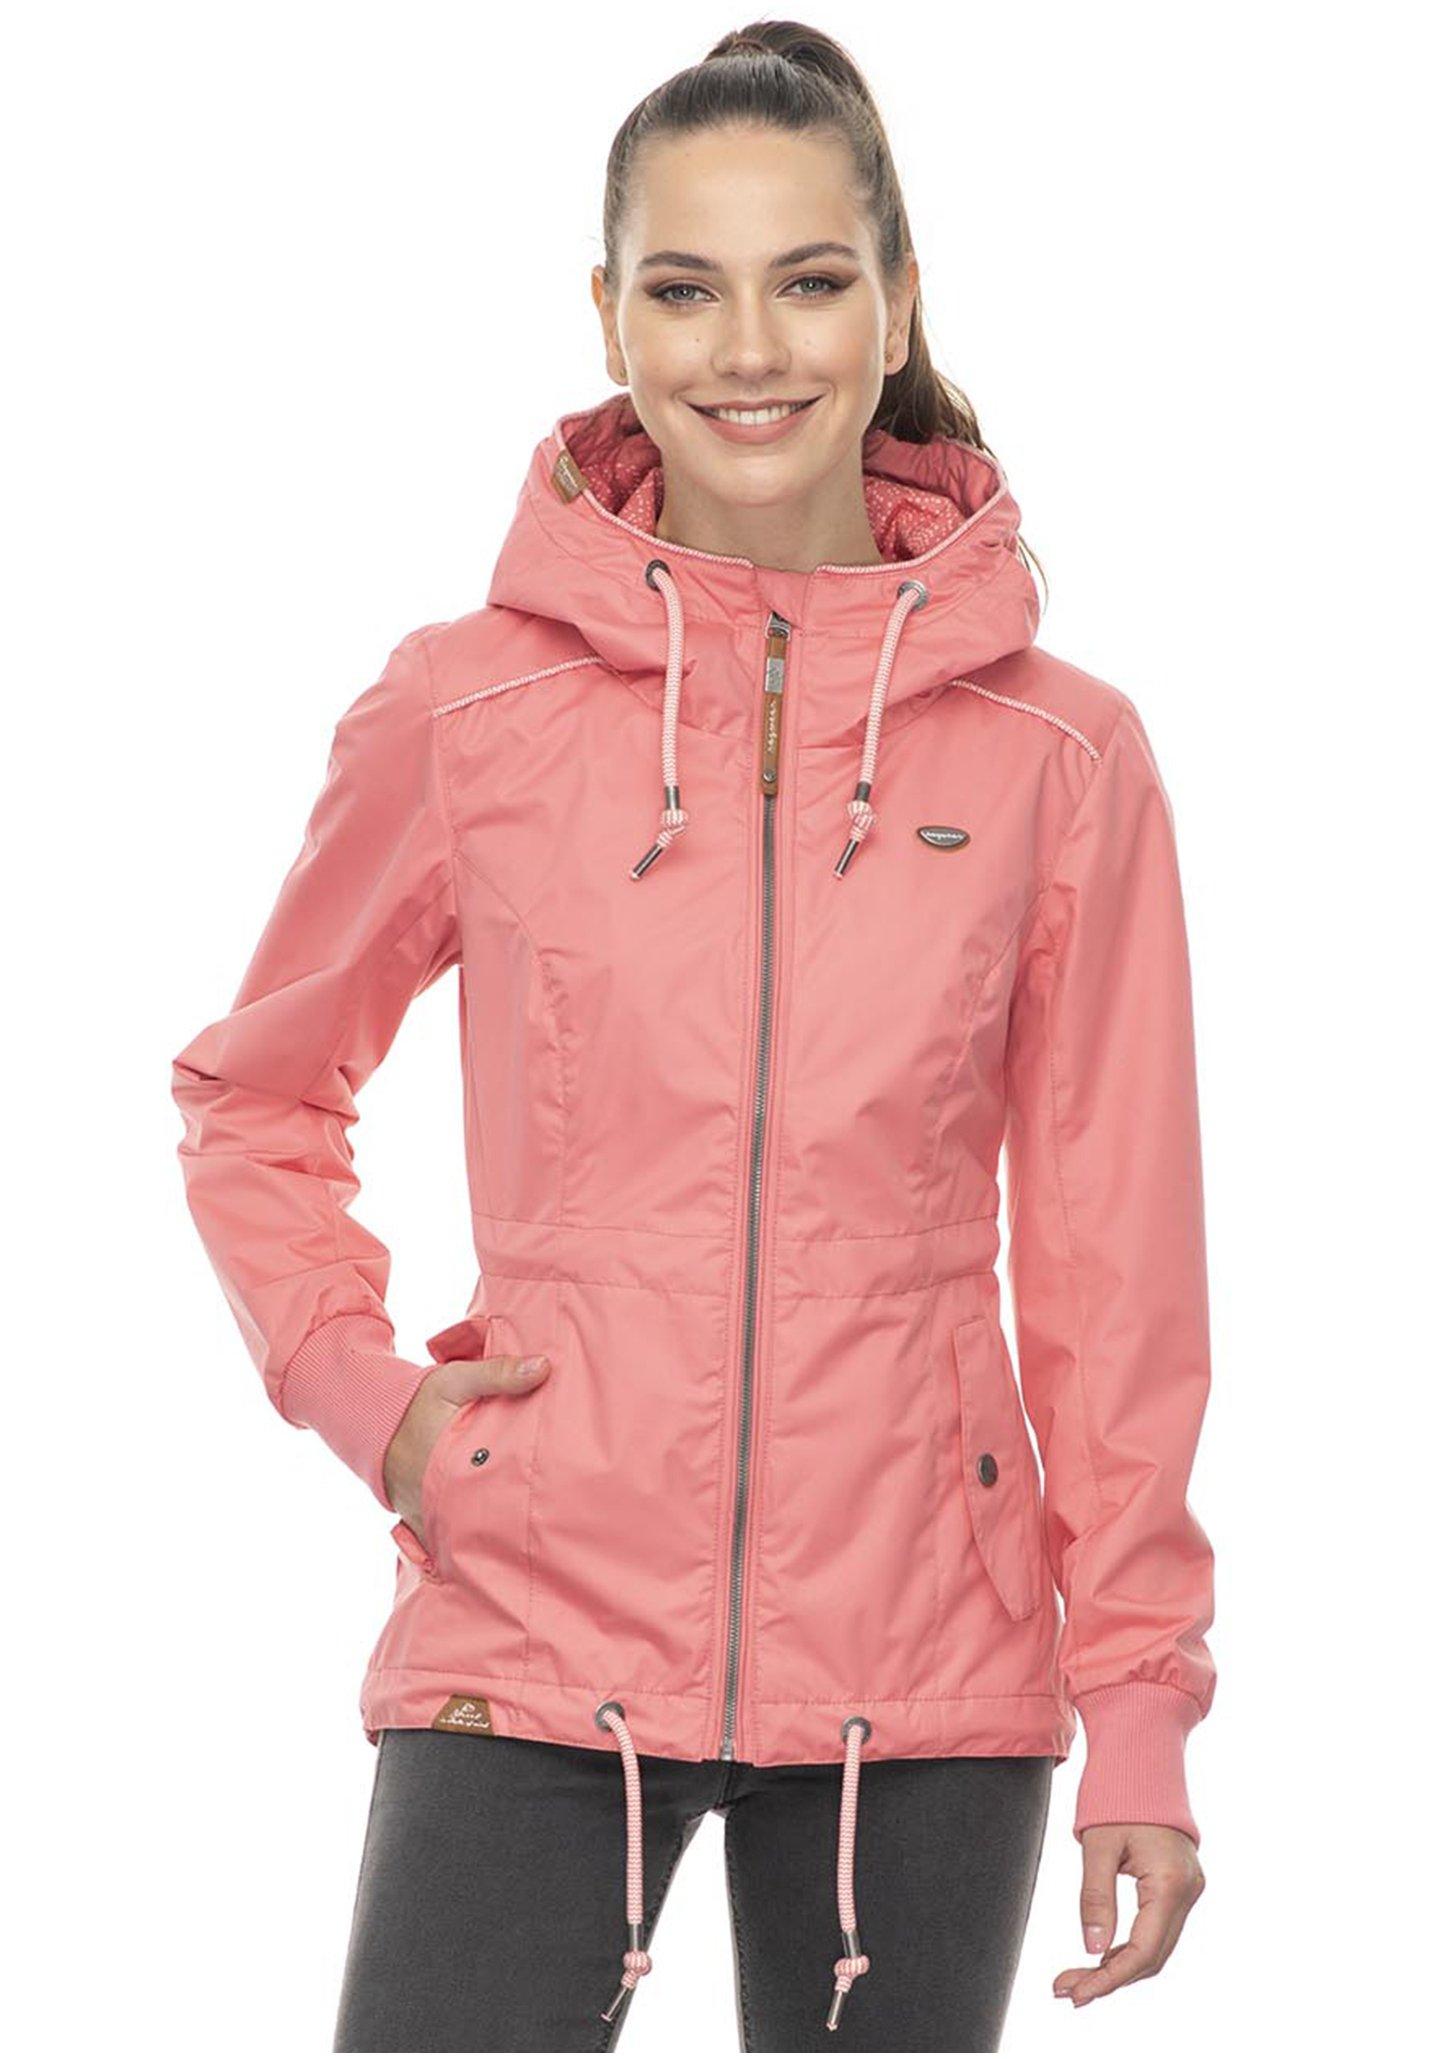 ragwear Monadis Jacke für Damen Pink Planet Sports